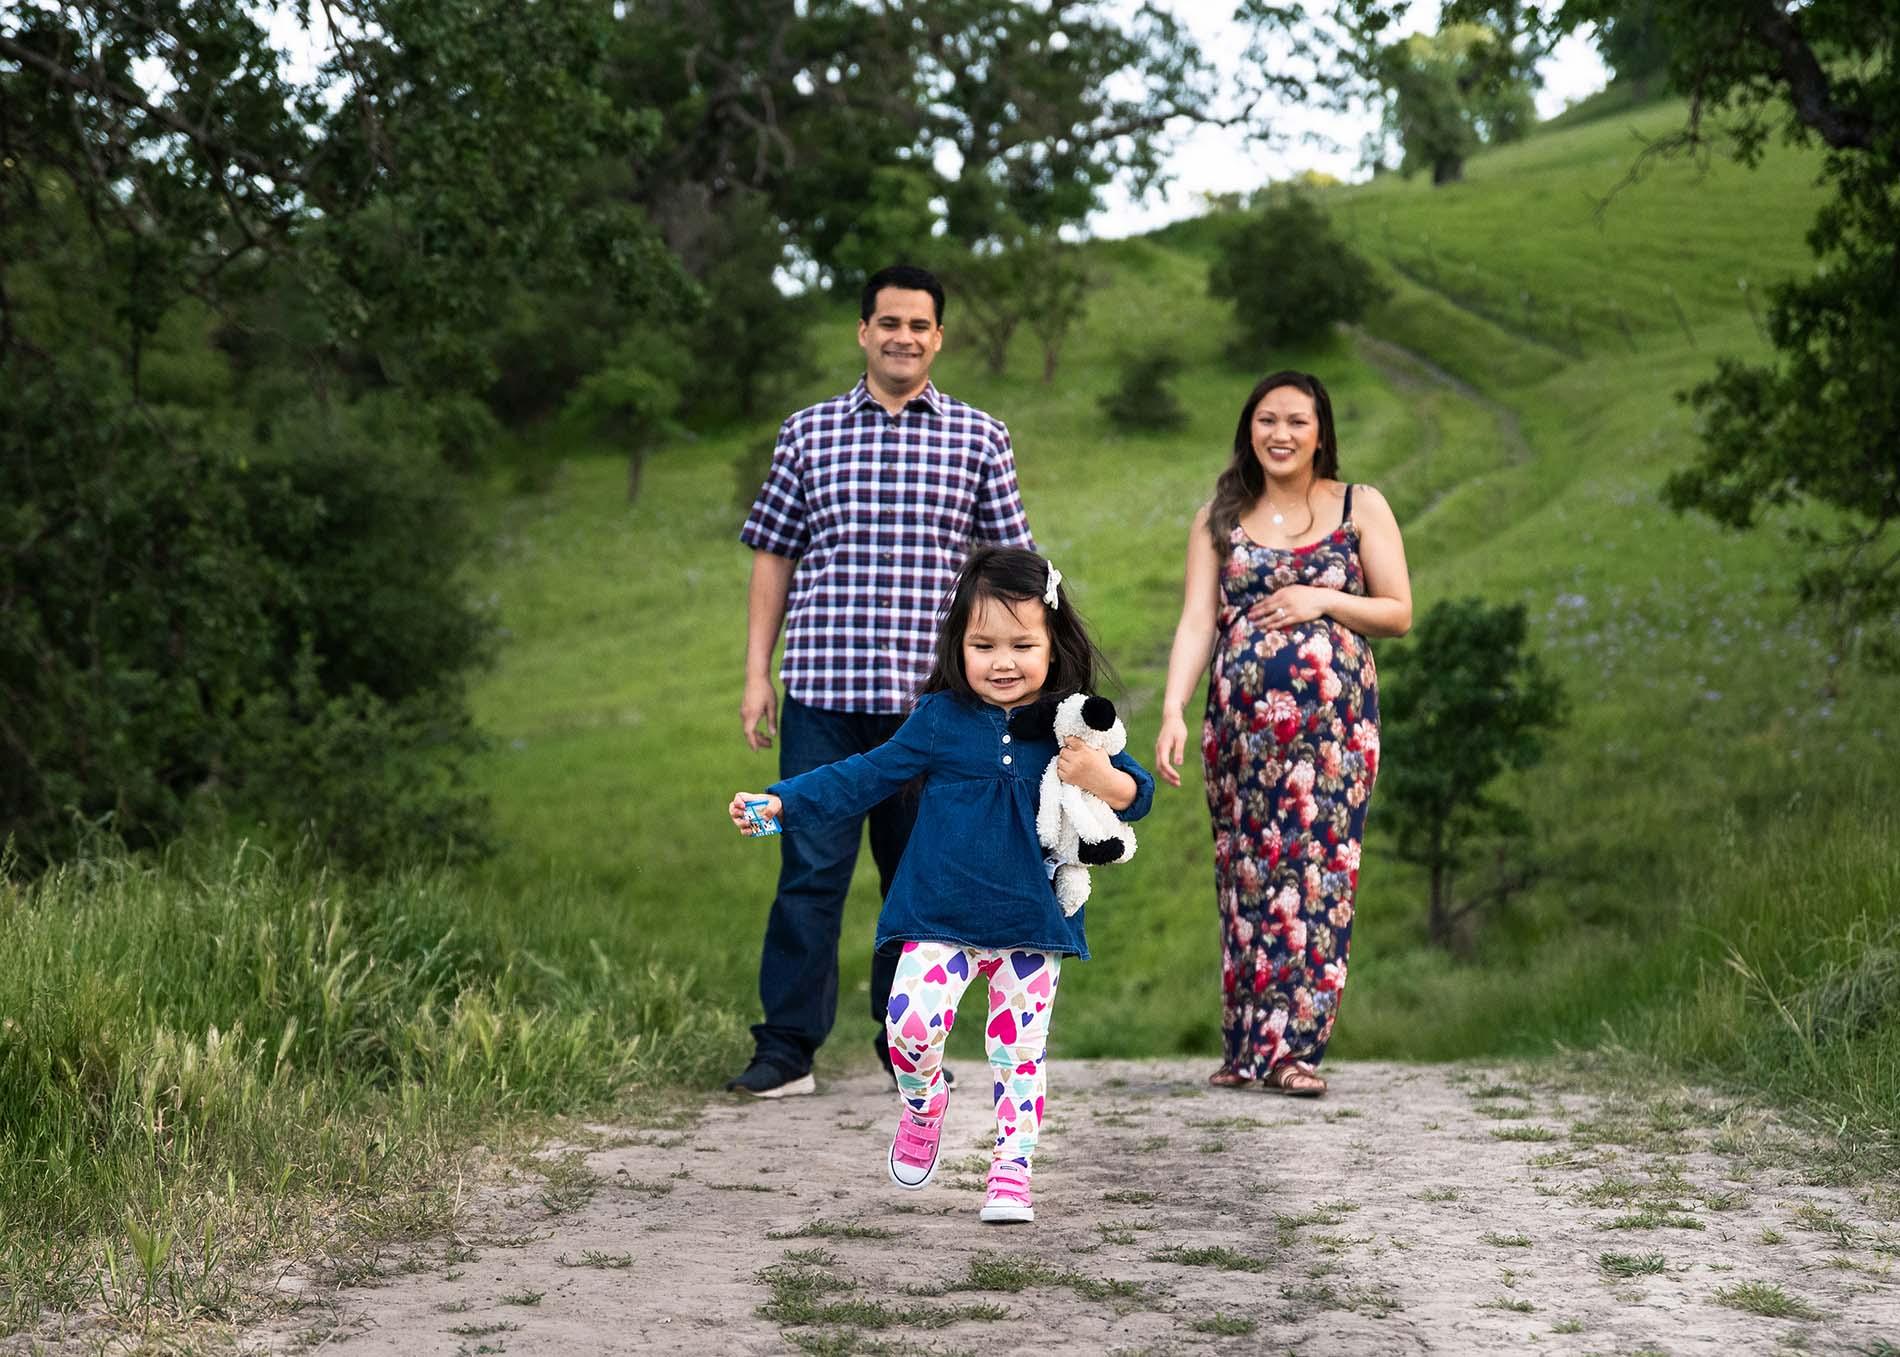 sharon kenney maternity photographer